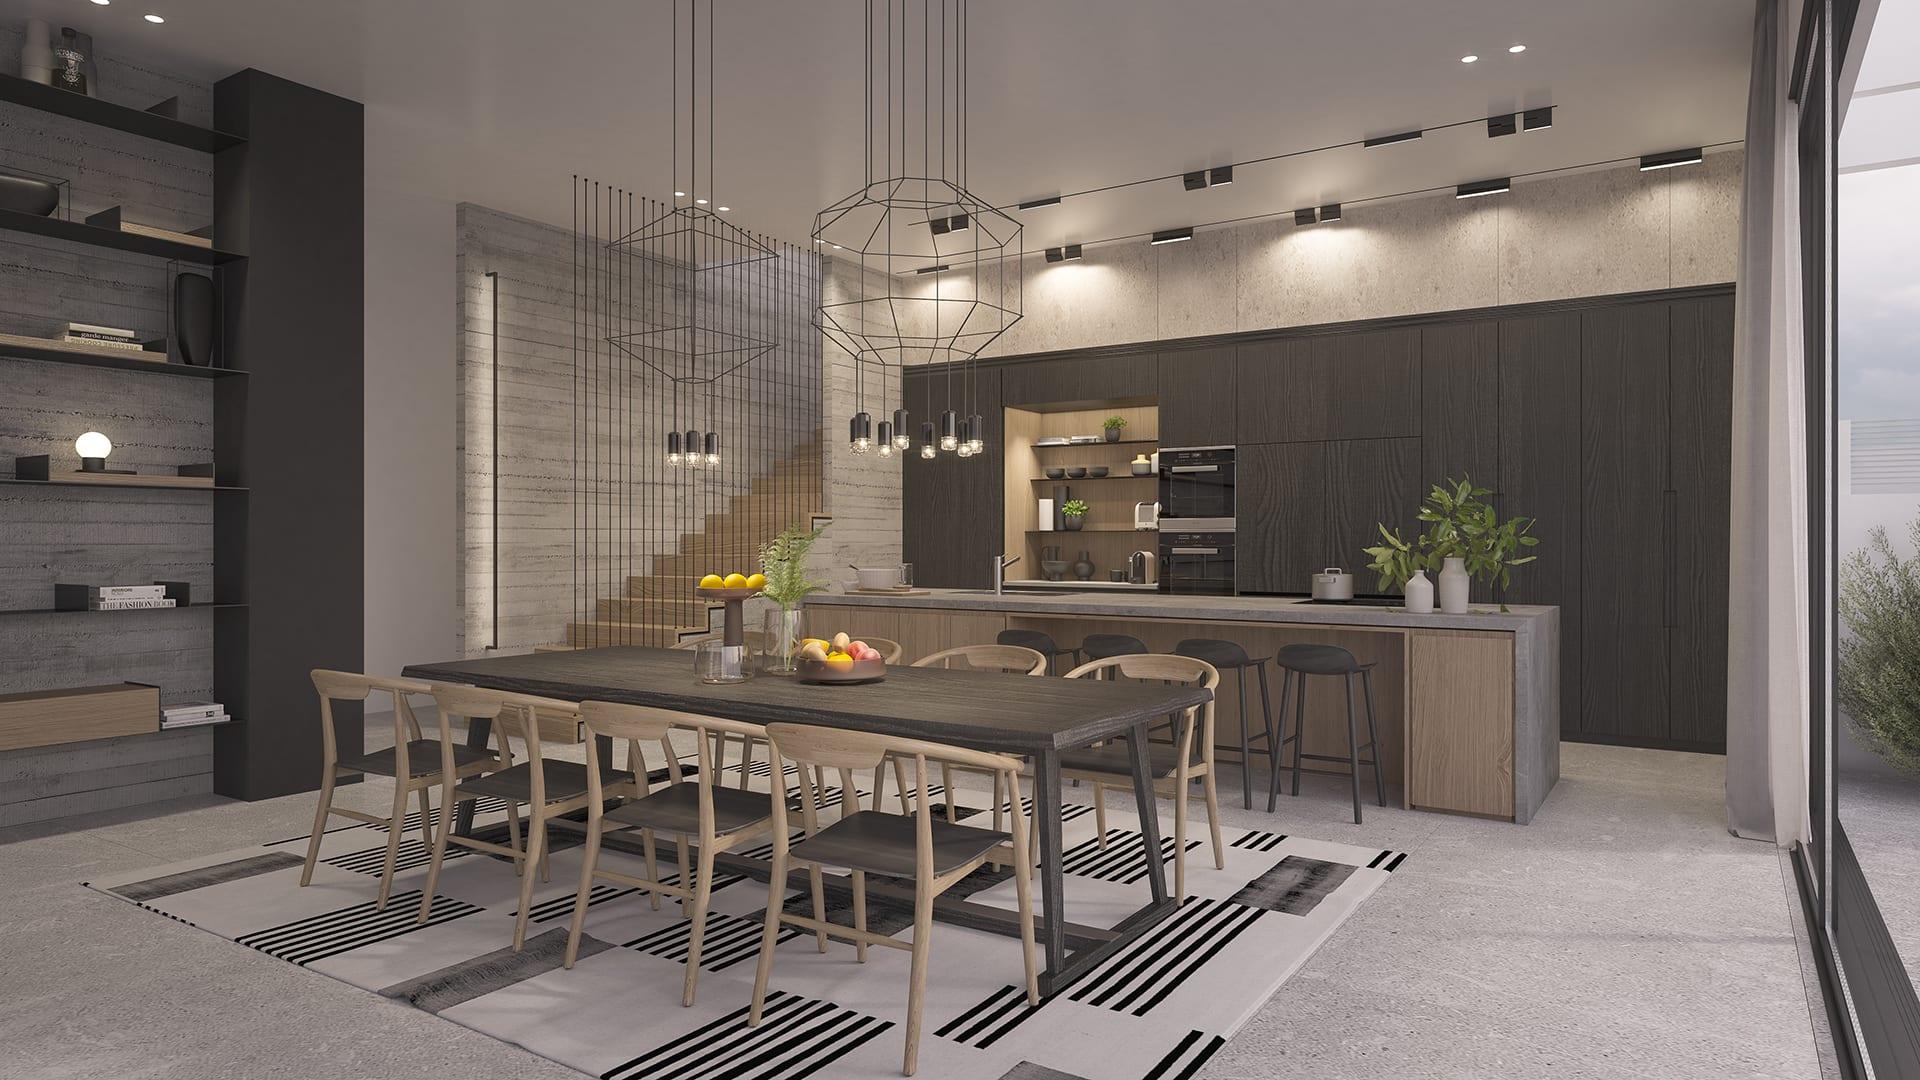 Maayan-Golan_Architectural-Visualization_interior-visualization_private-house_kitchen-dining-room_interior-design-by-sharon-maayan_02